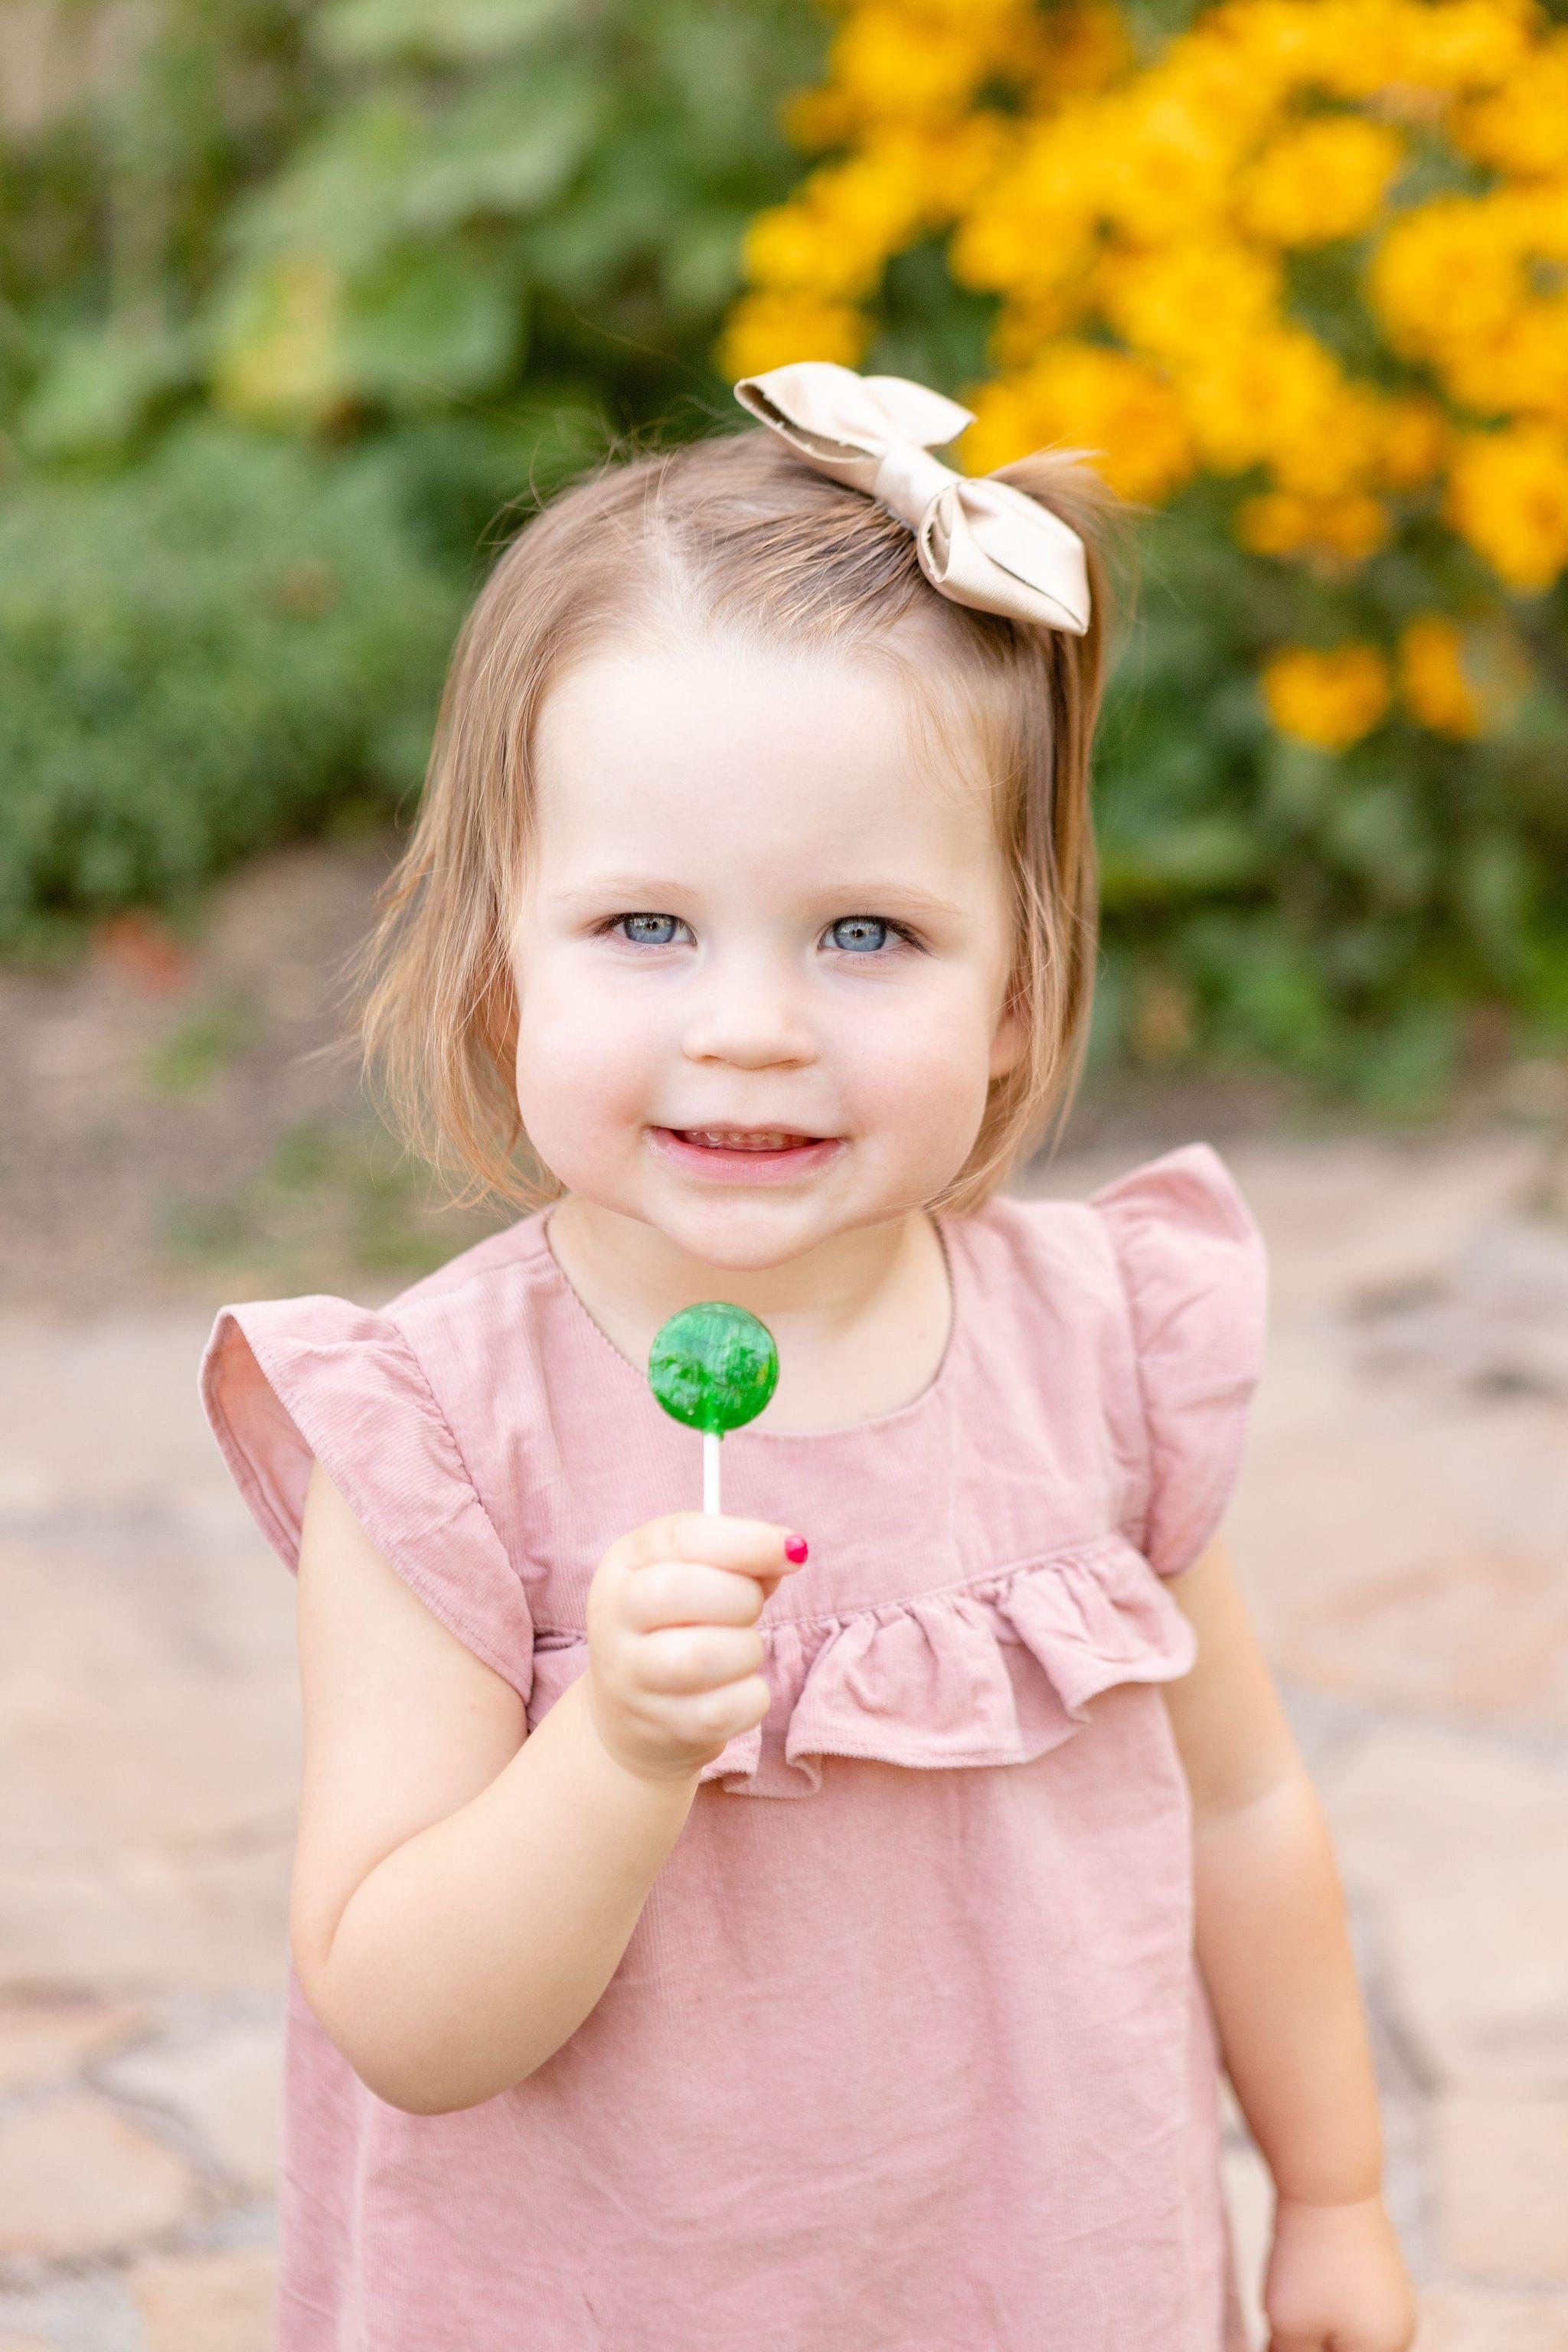 2469e868344d479c6427442e566fd623 - How To Get A Toddler To Smile For Pictures